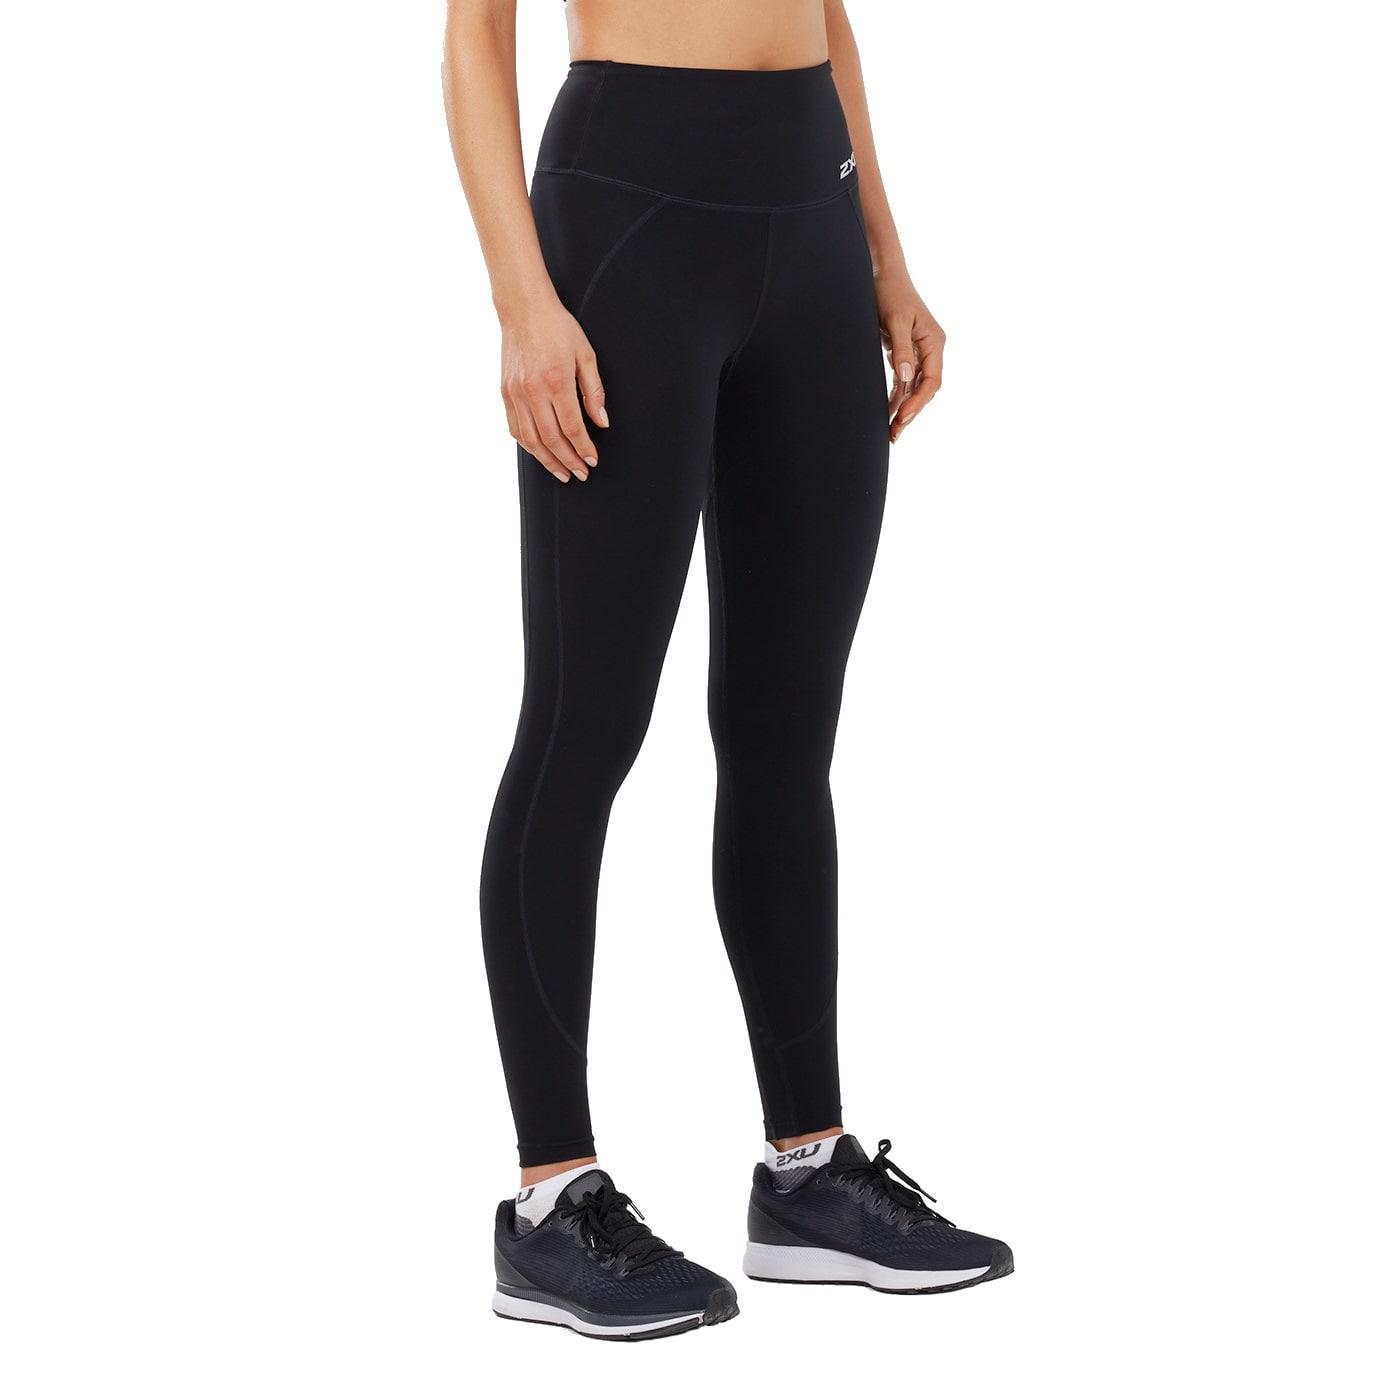 2XU Women/'s Fitness Hi-Rise Compression Tights